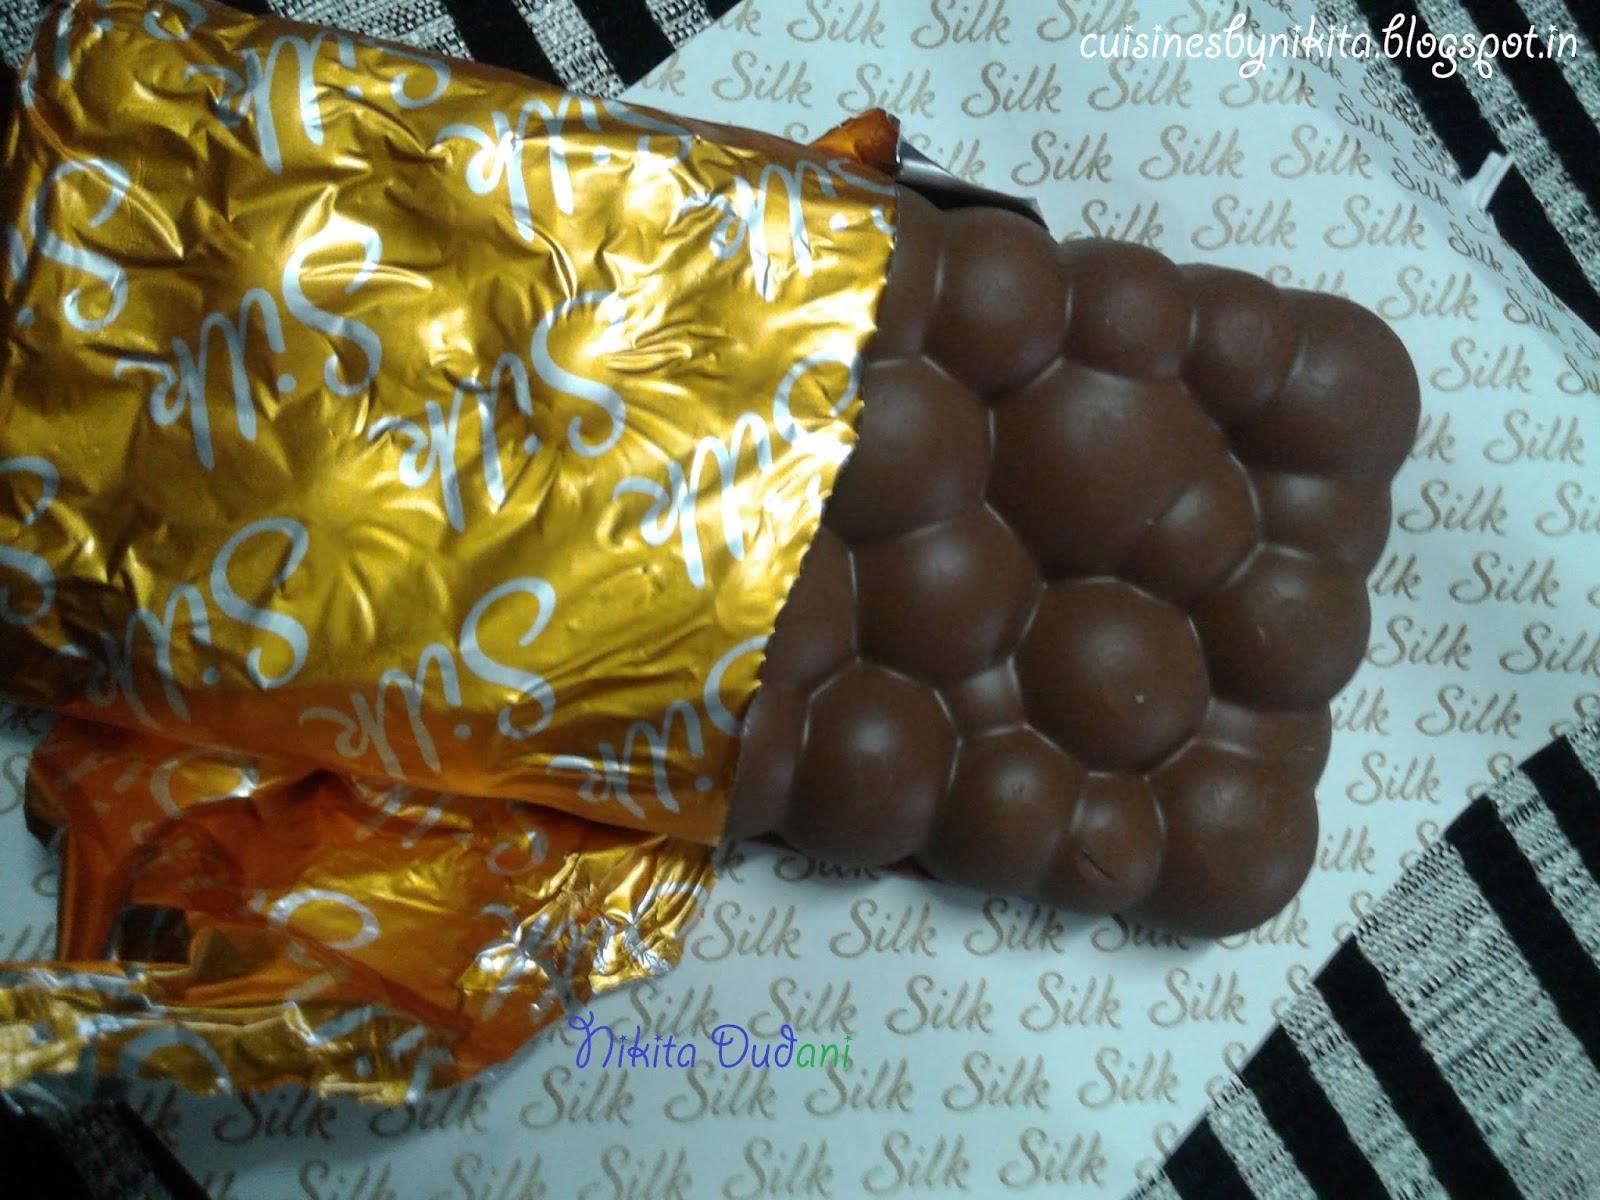 Product Review: Cadbury Dairy Milk Silk Bubbly